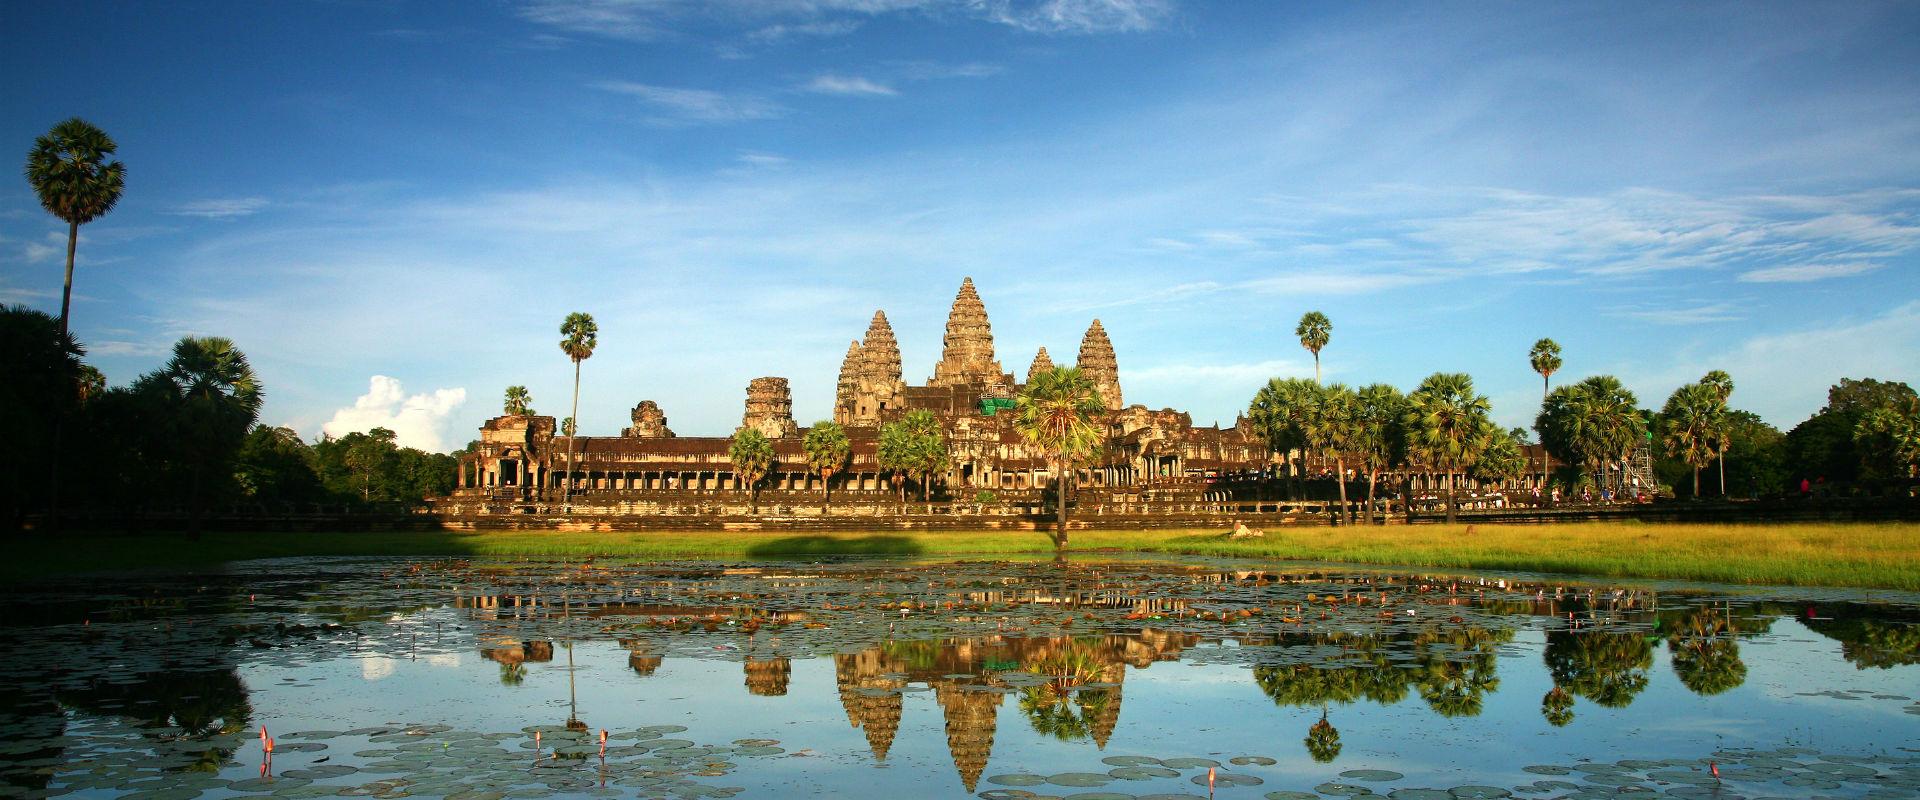 Angkor-Wat-Siem-Reap-Cambodia-800